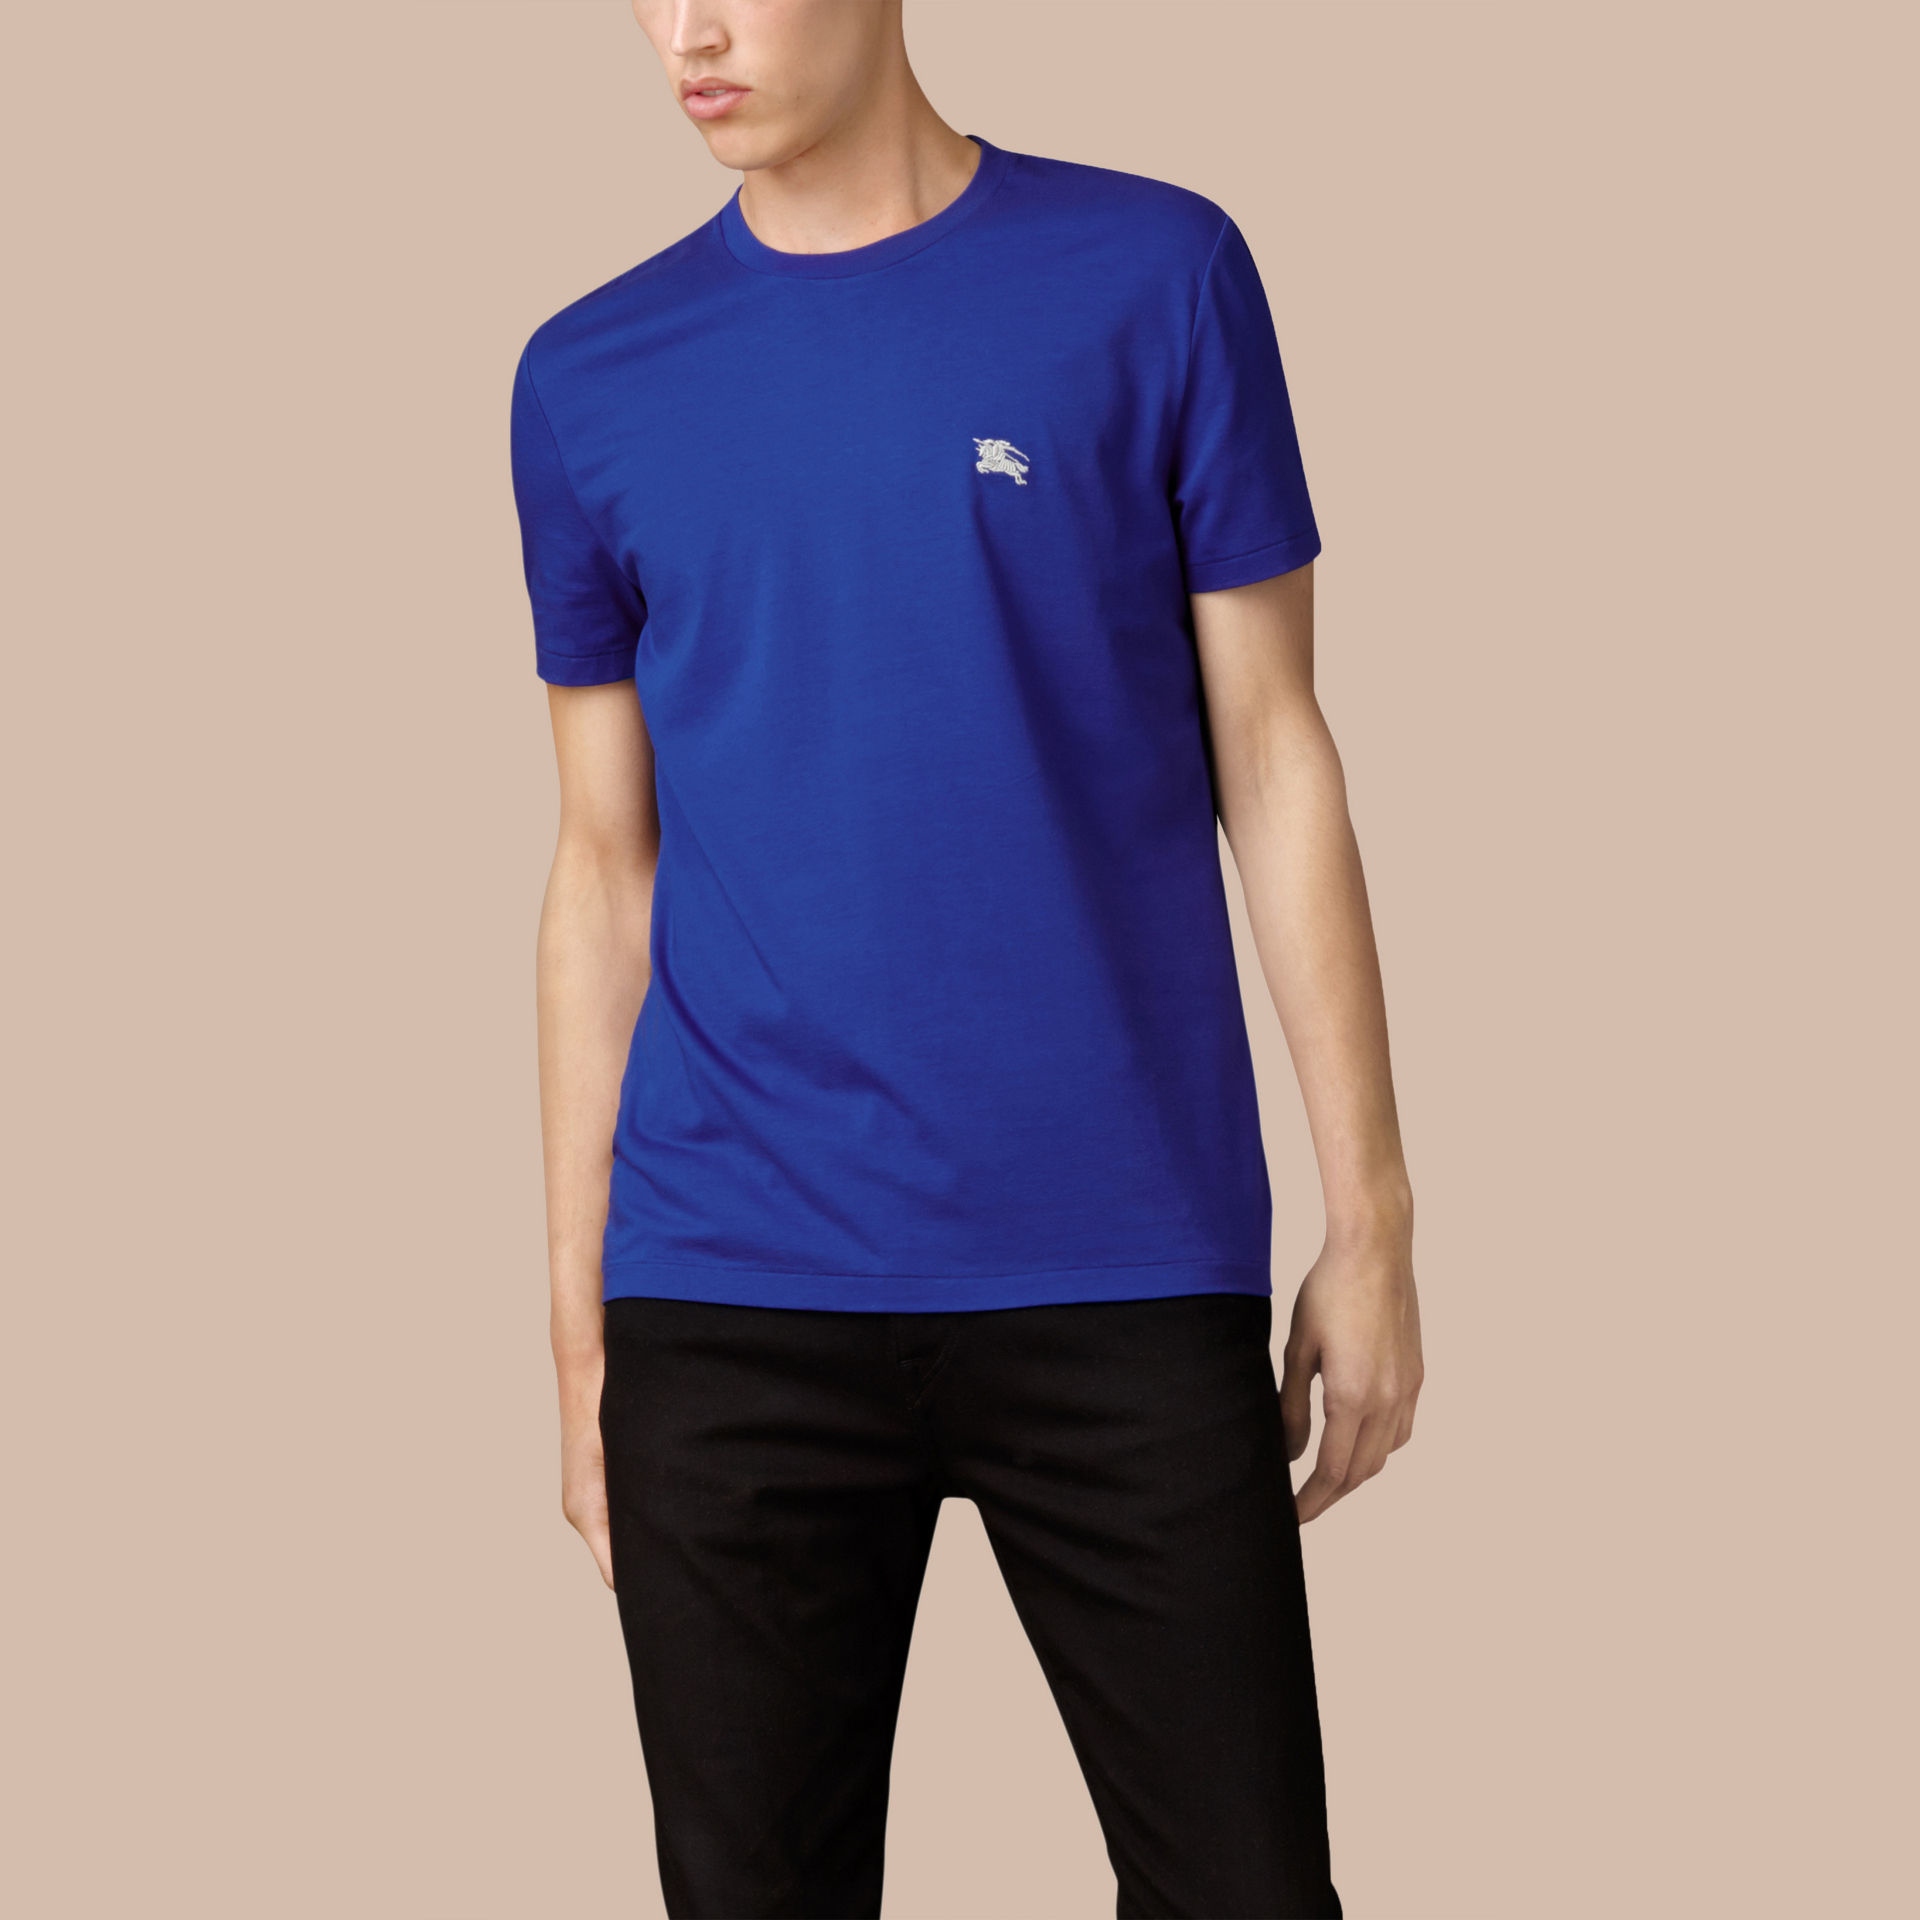 Burberry liquid soft cotton t shirt bright lapis in blue for Soft cotton dress shirts